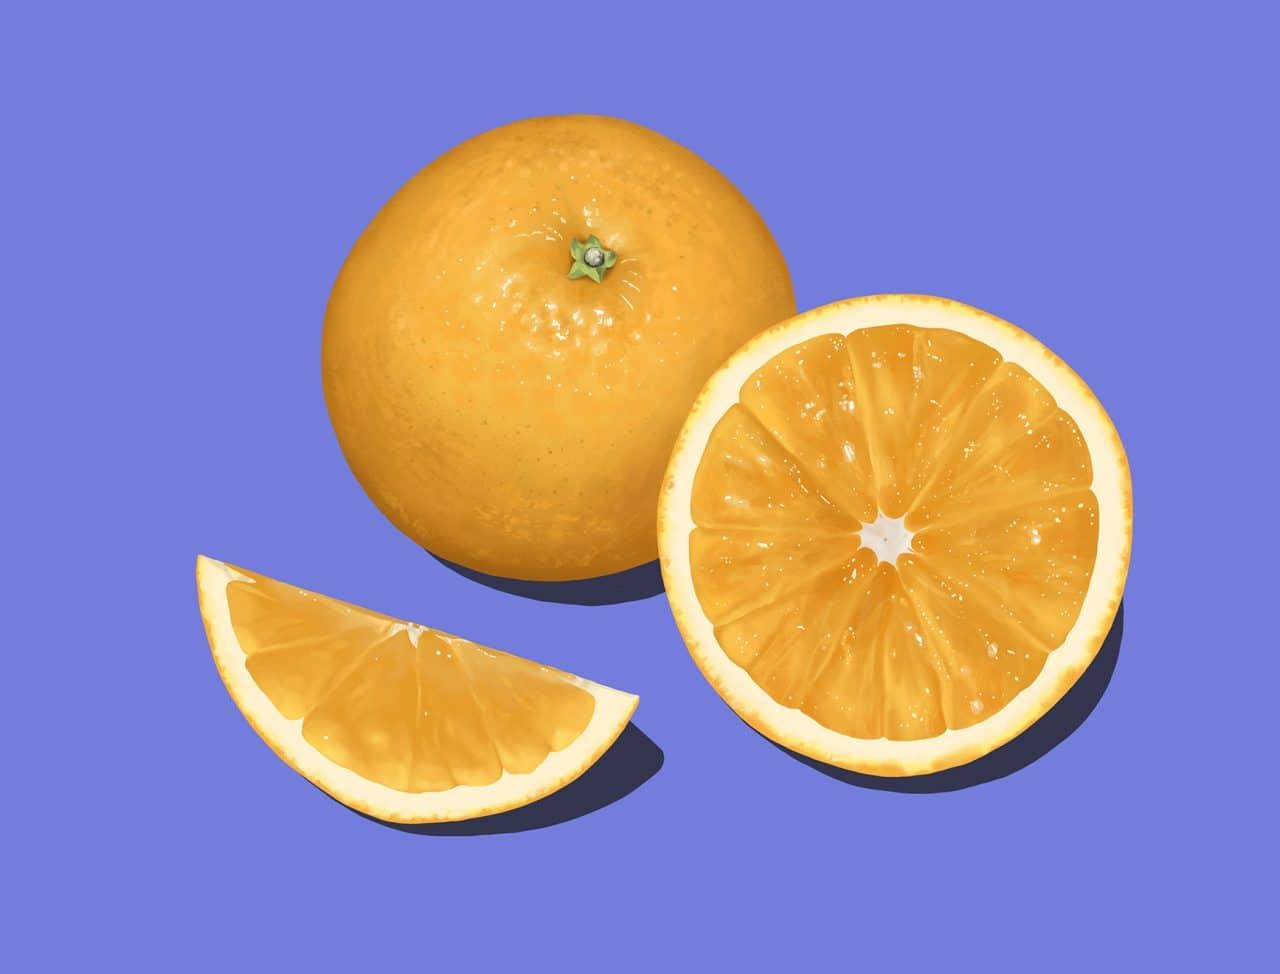 How To Draw an Orange Step by Step Procreate Tutorial